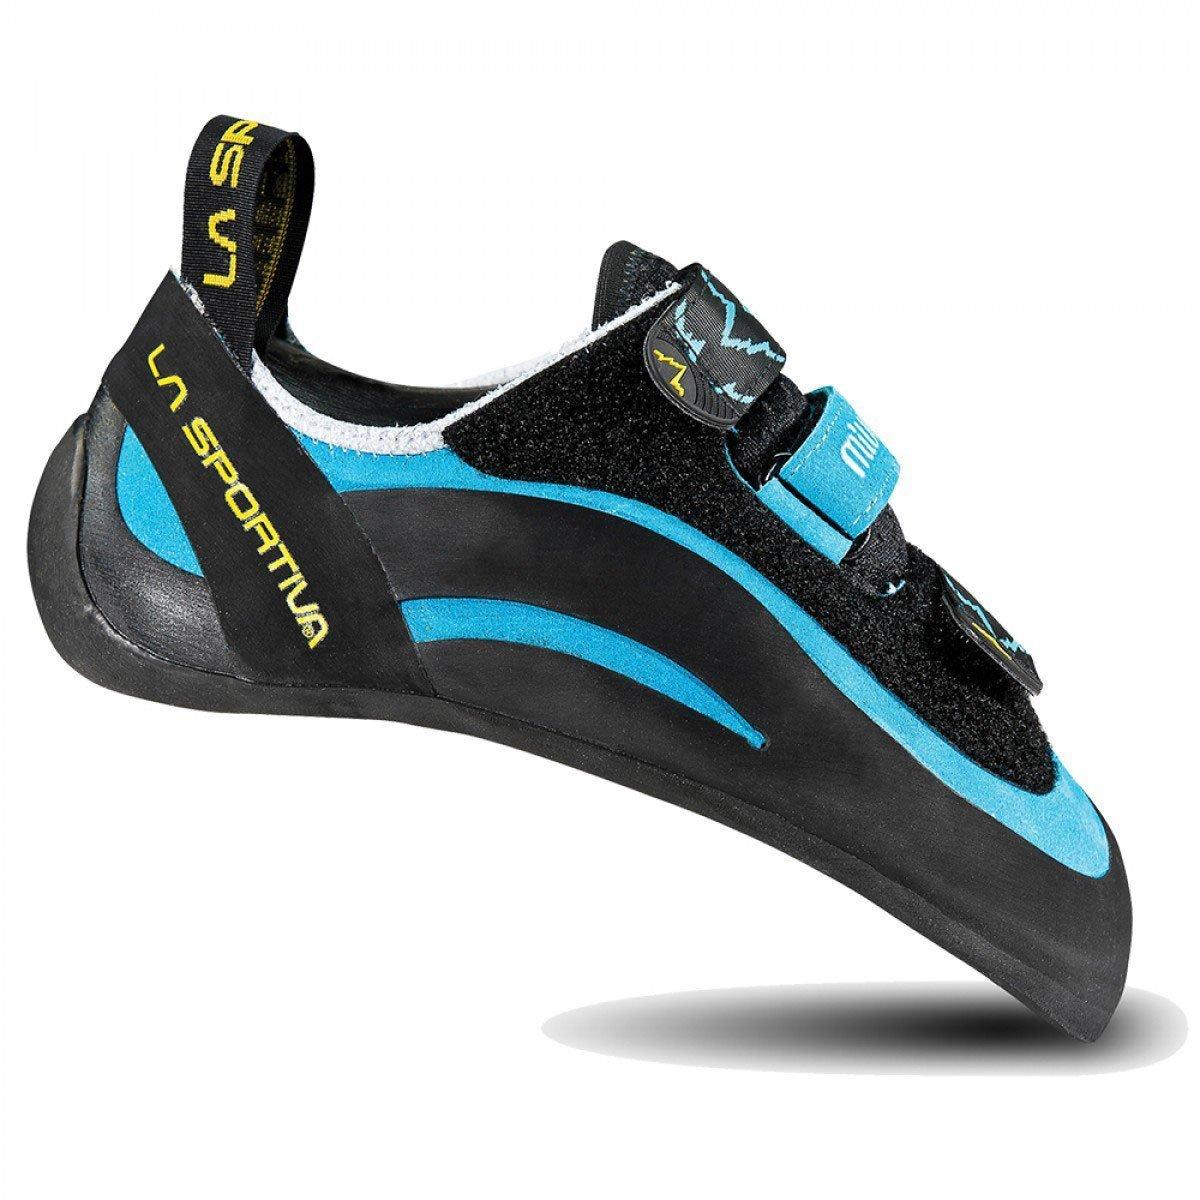 La Sportiva Miura VS Climbing Shoe - Women's B01APY3N54 35.5 M EU|Blue